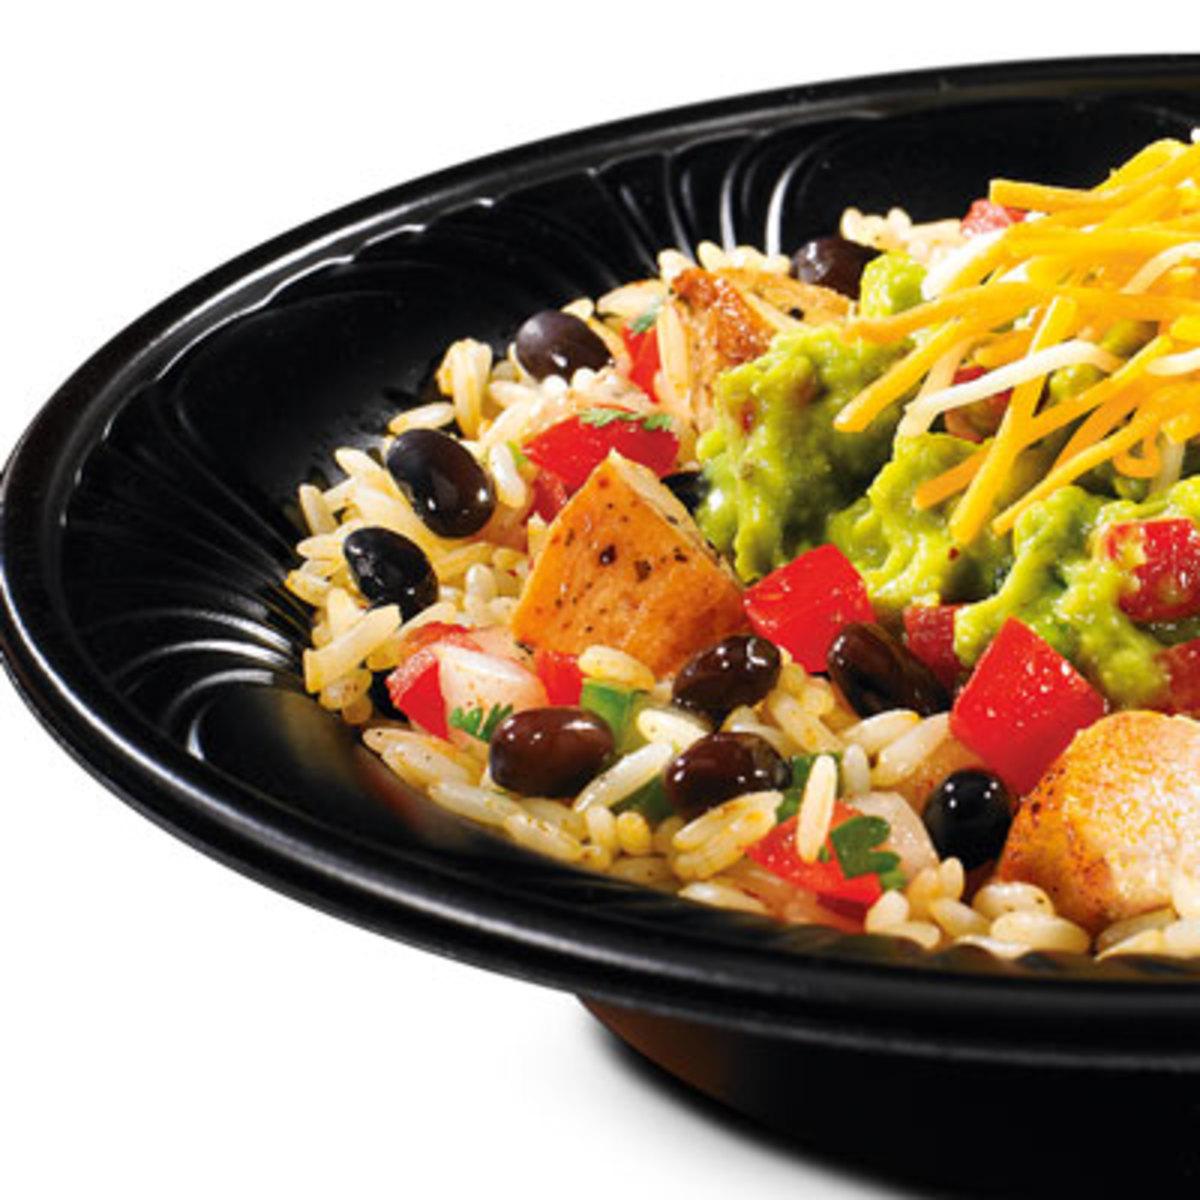 Best Vegetarian Chain Restaurants: Midwest Fast-Food Edition